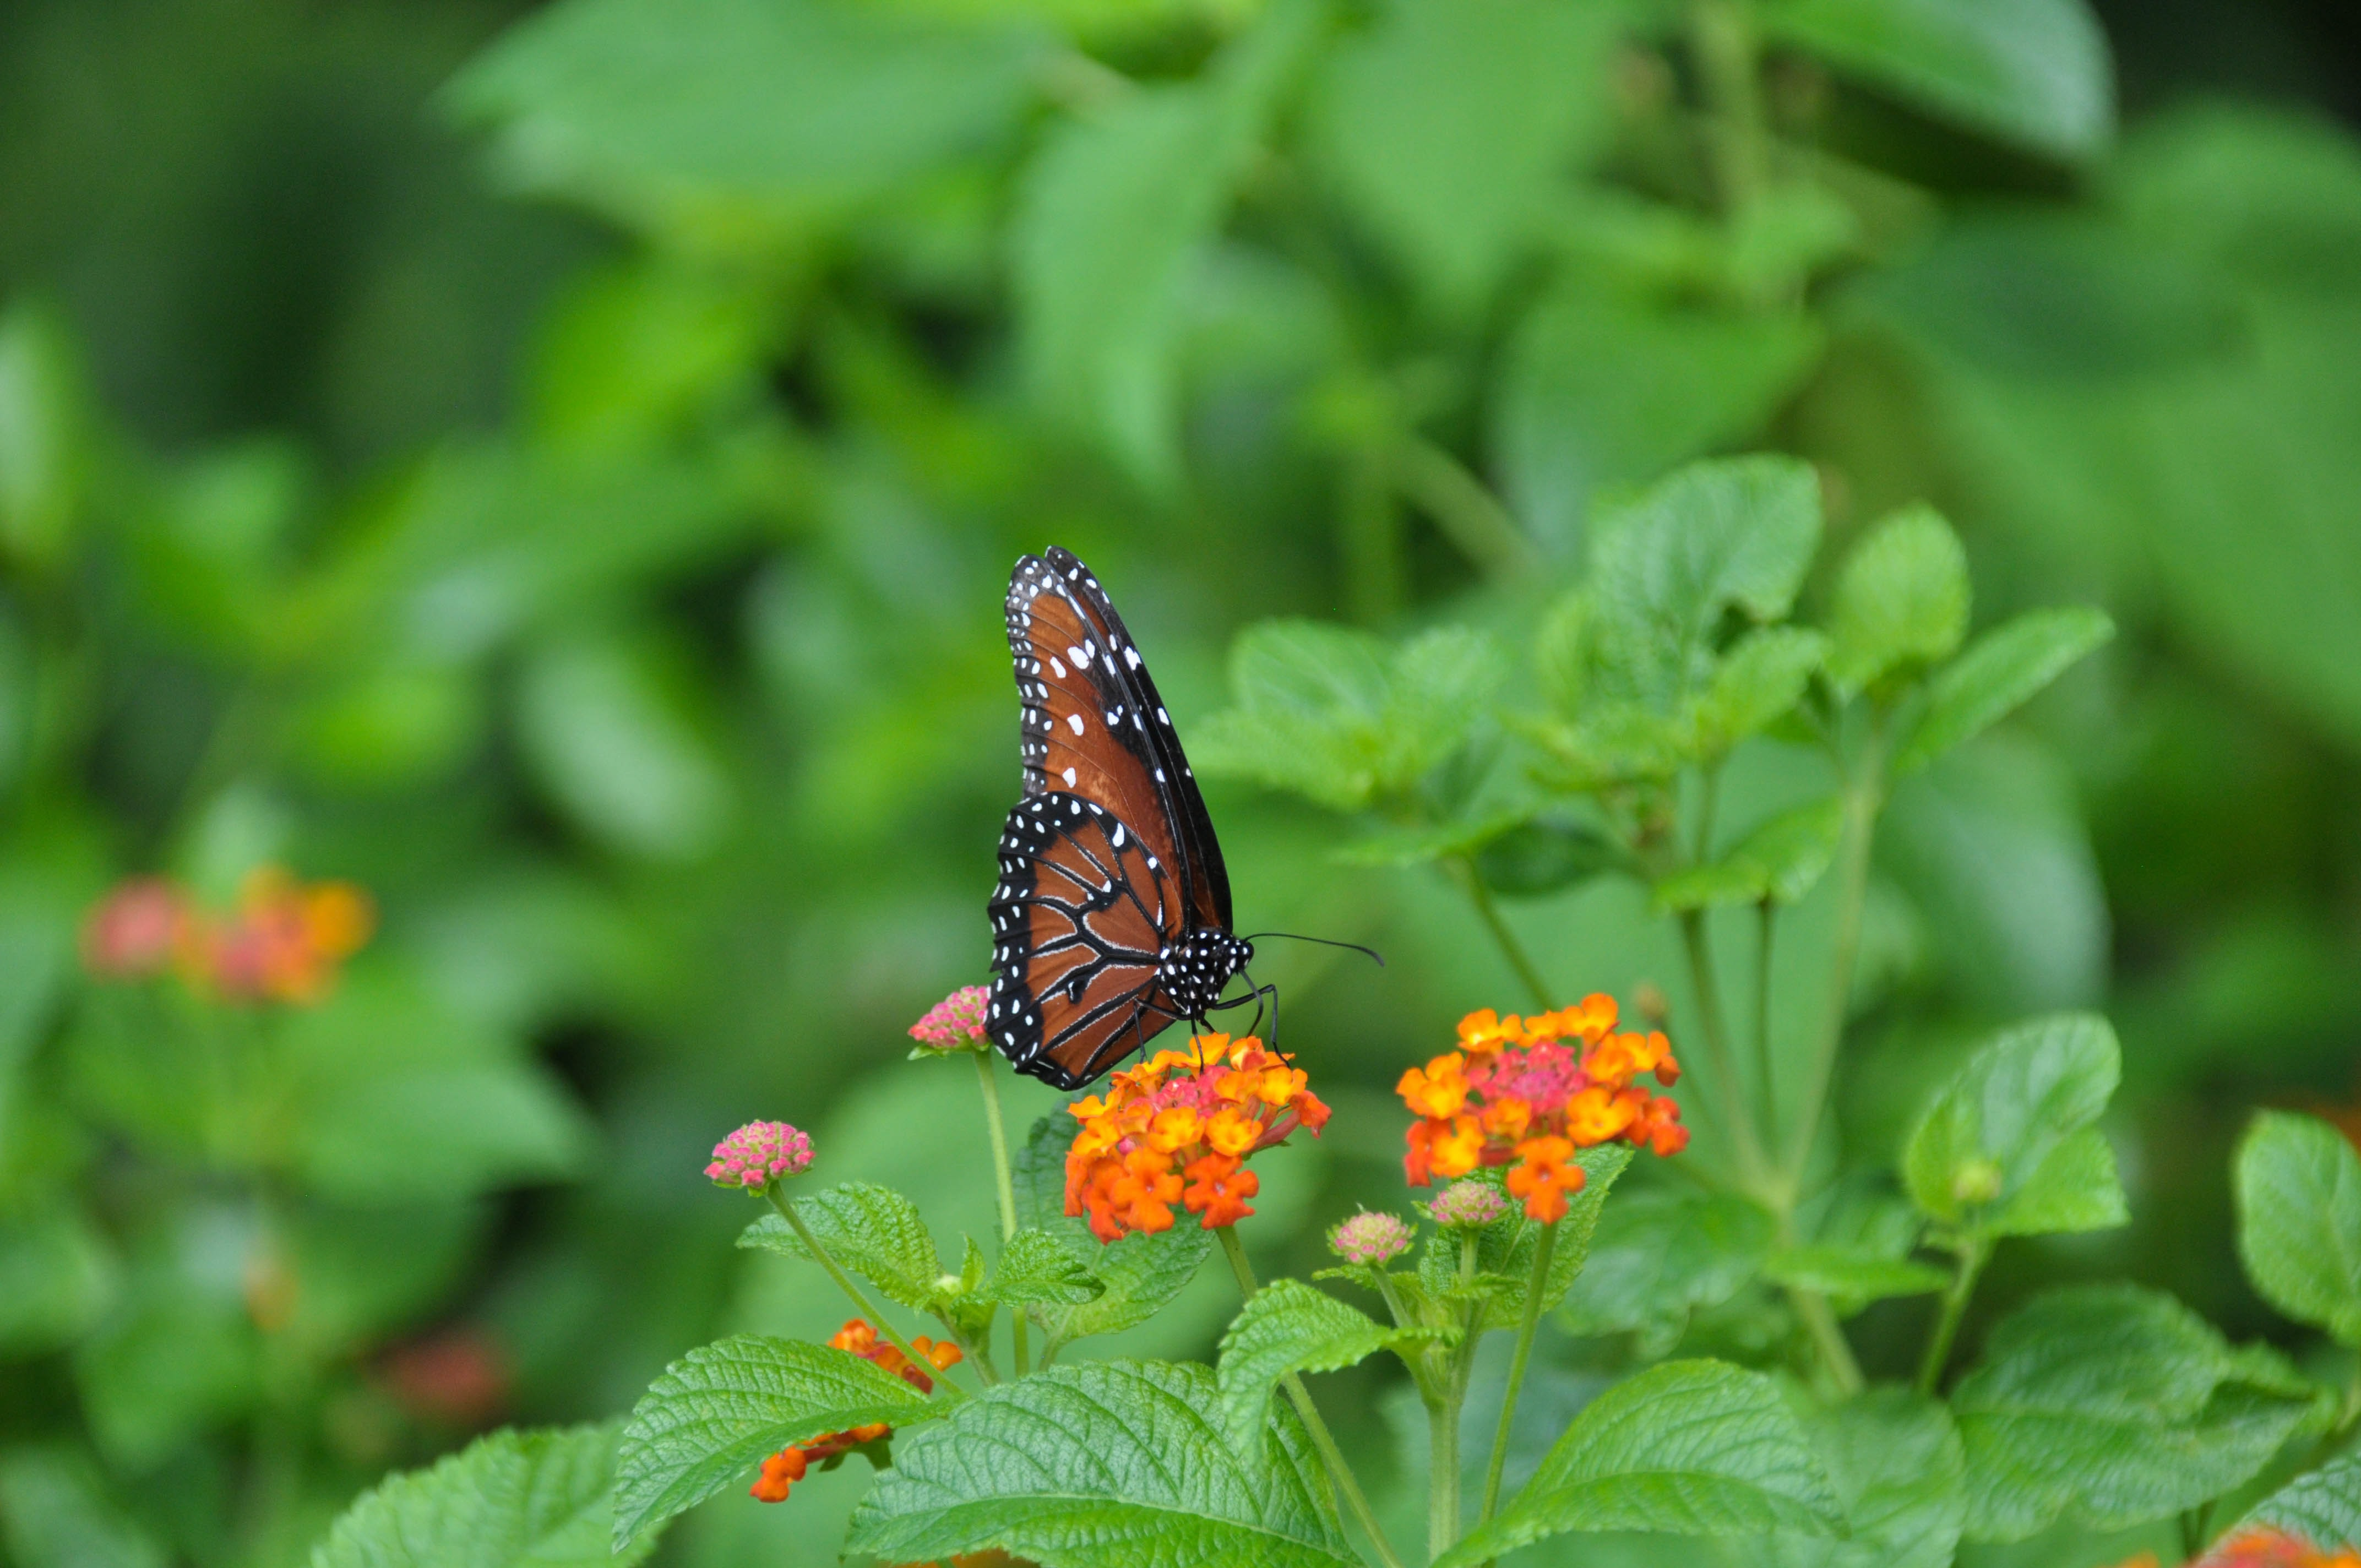 brown and black pollinating on orange petaled flower